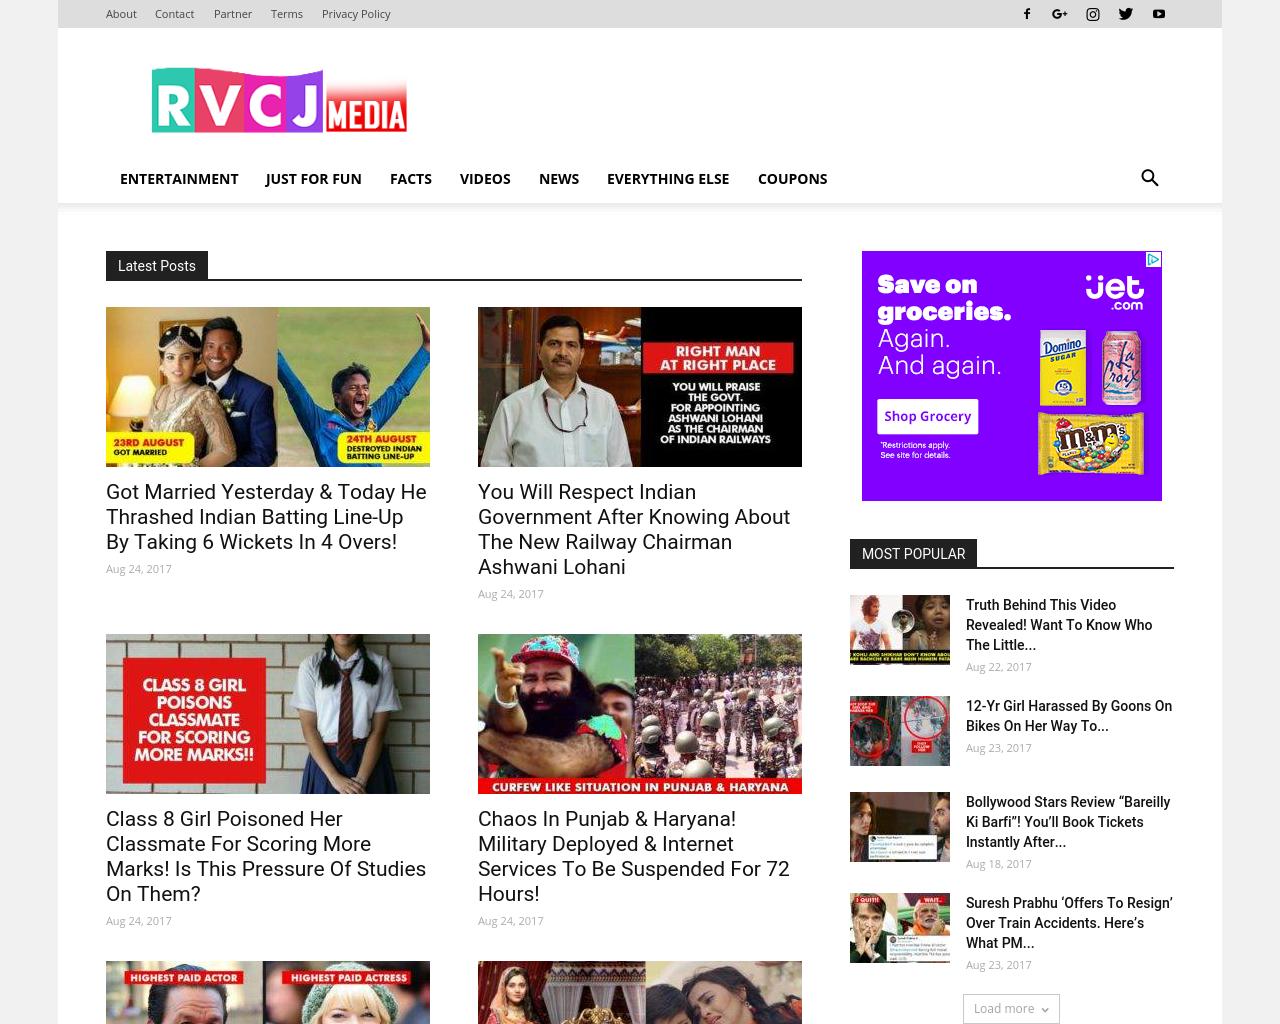 Rajnikant-V/s-CID-Jokes-Advertising-Reviews-Pricing